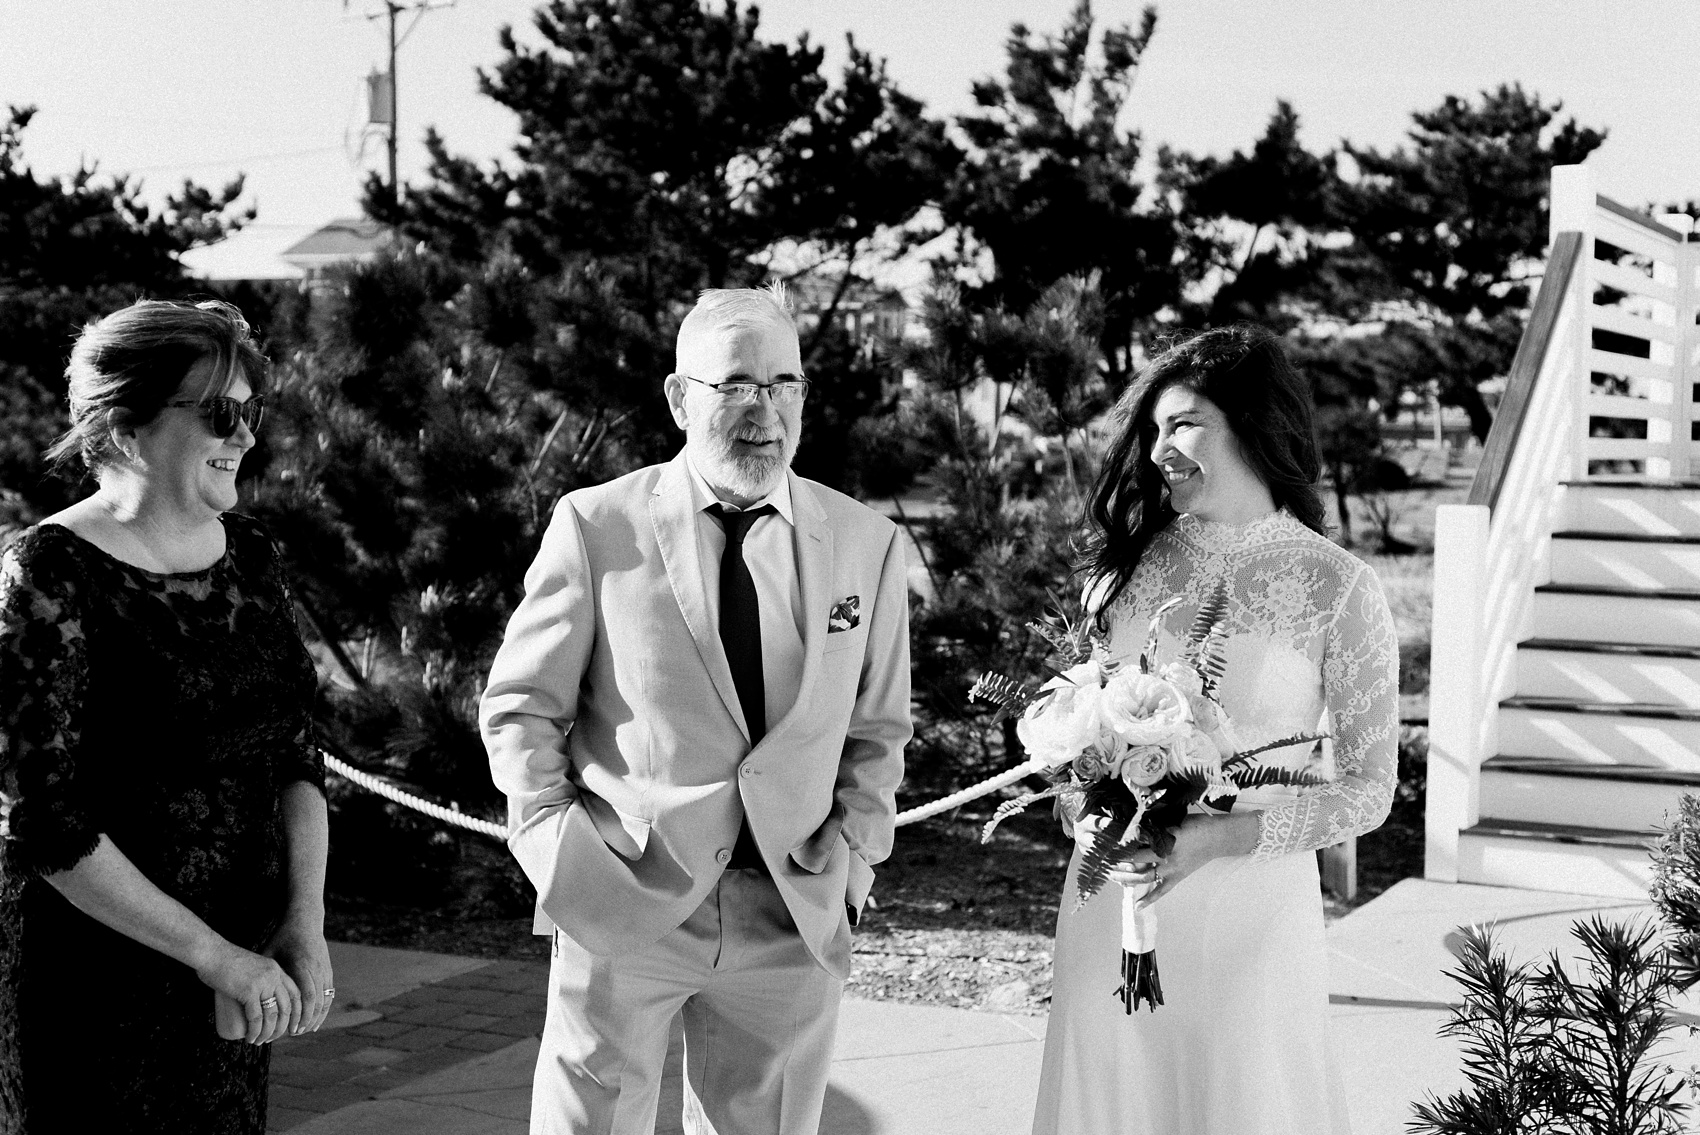 outerbanks_wedding_photographer_1270.jpg